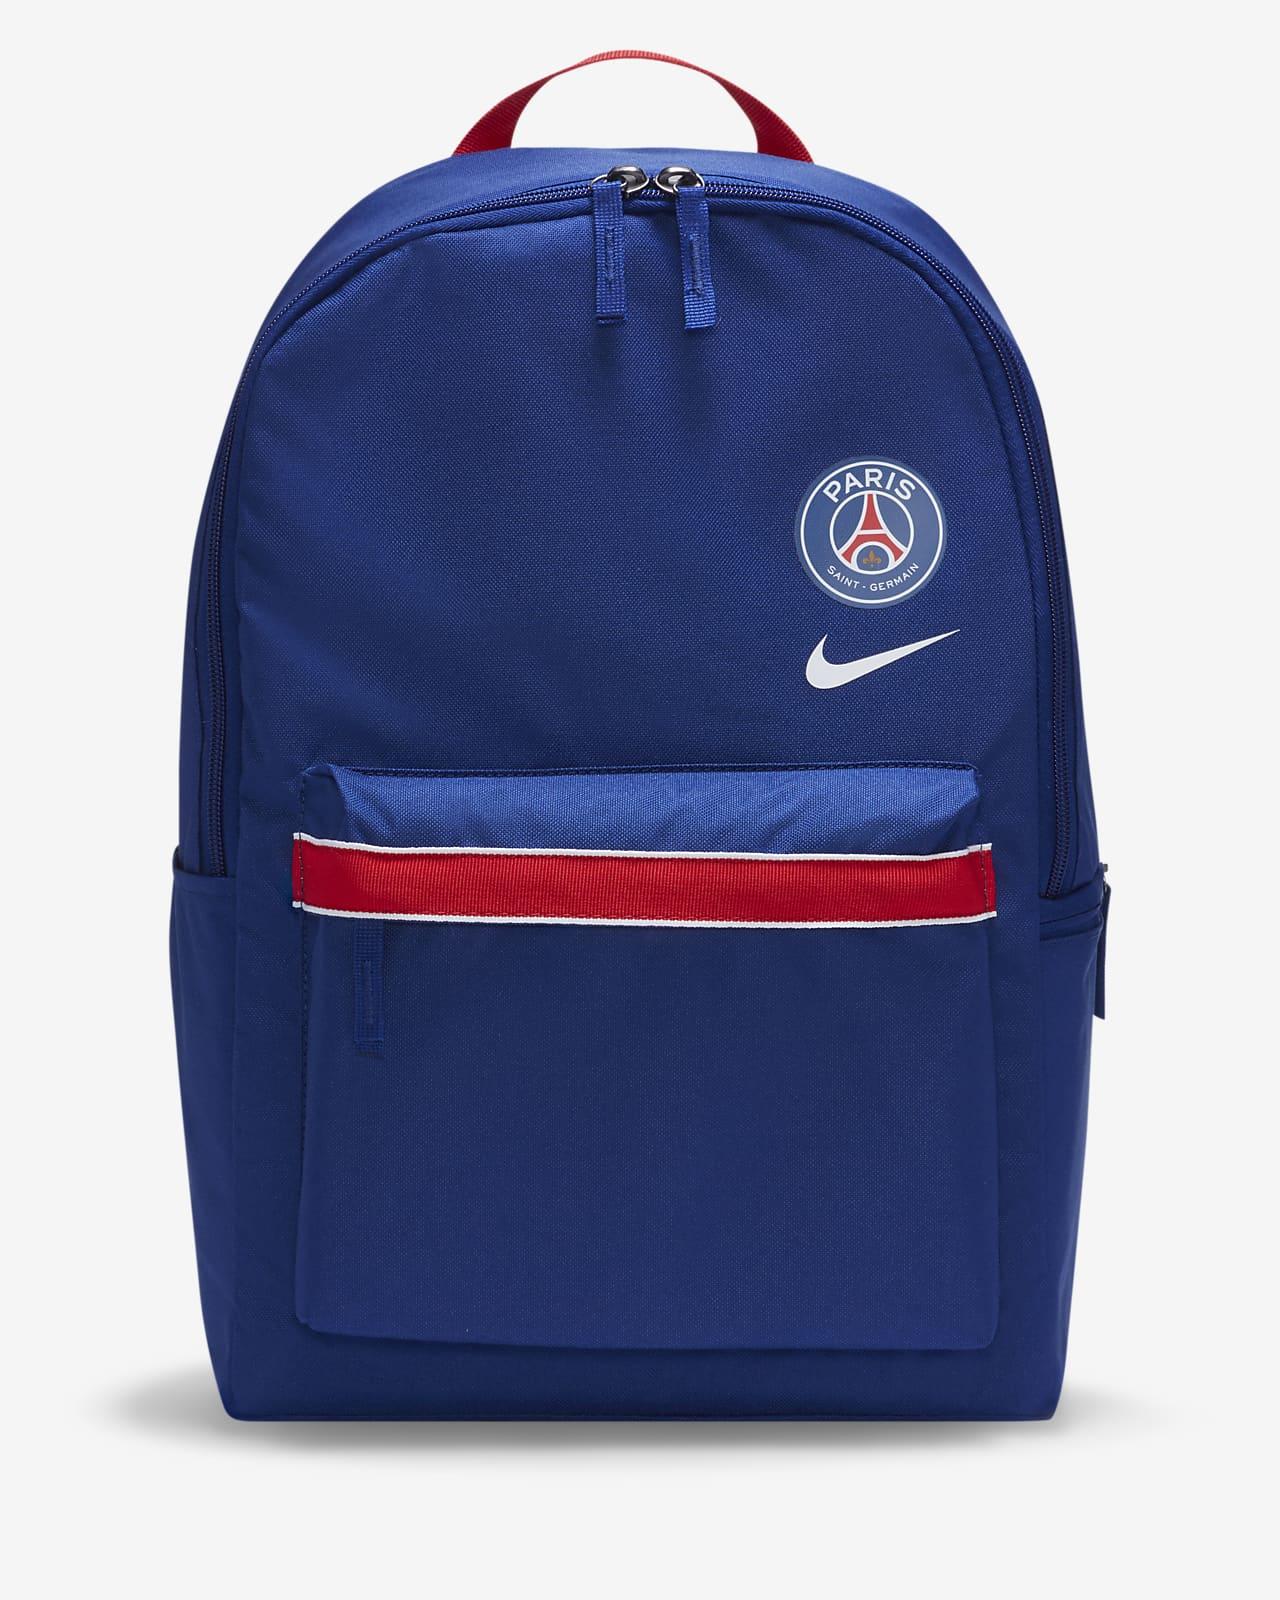 Paris Saint-Germain Stadium Football Backpack